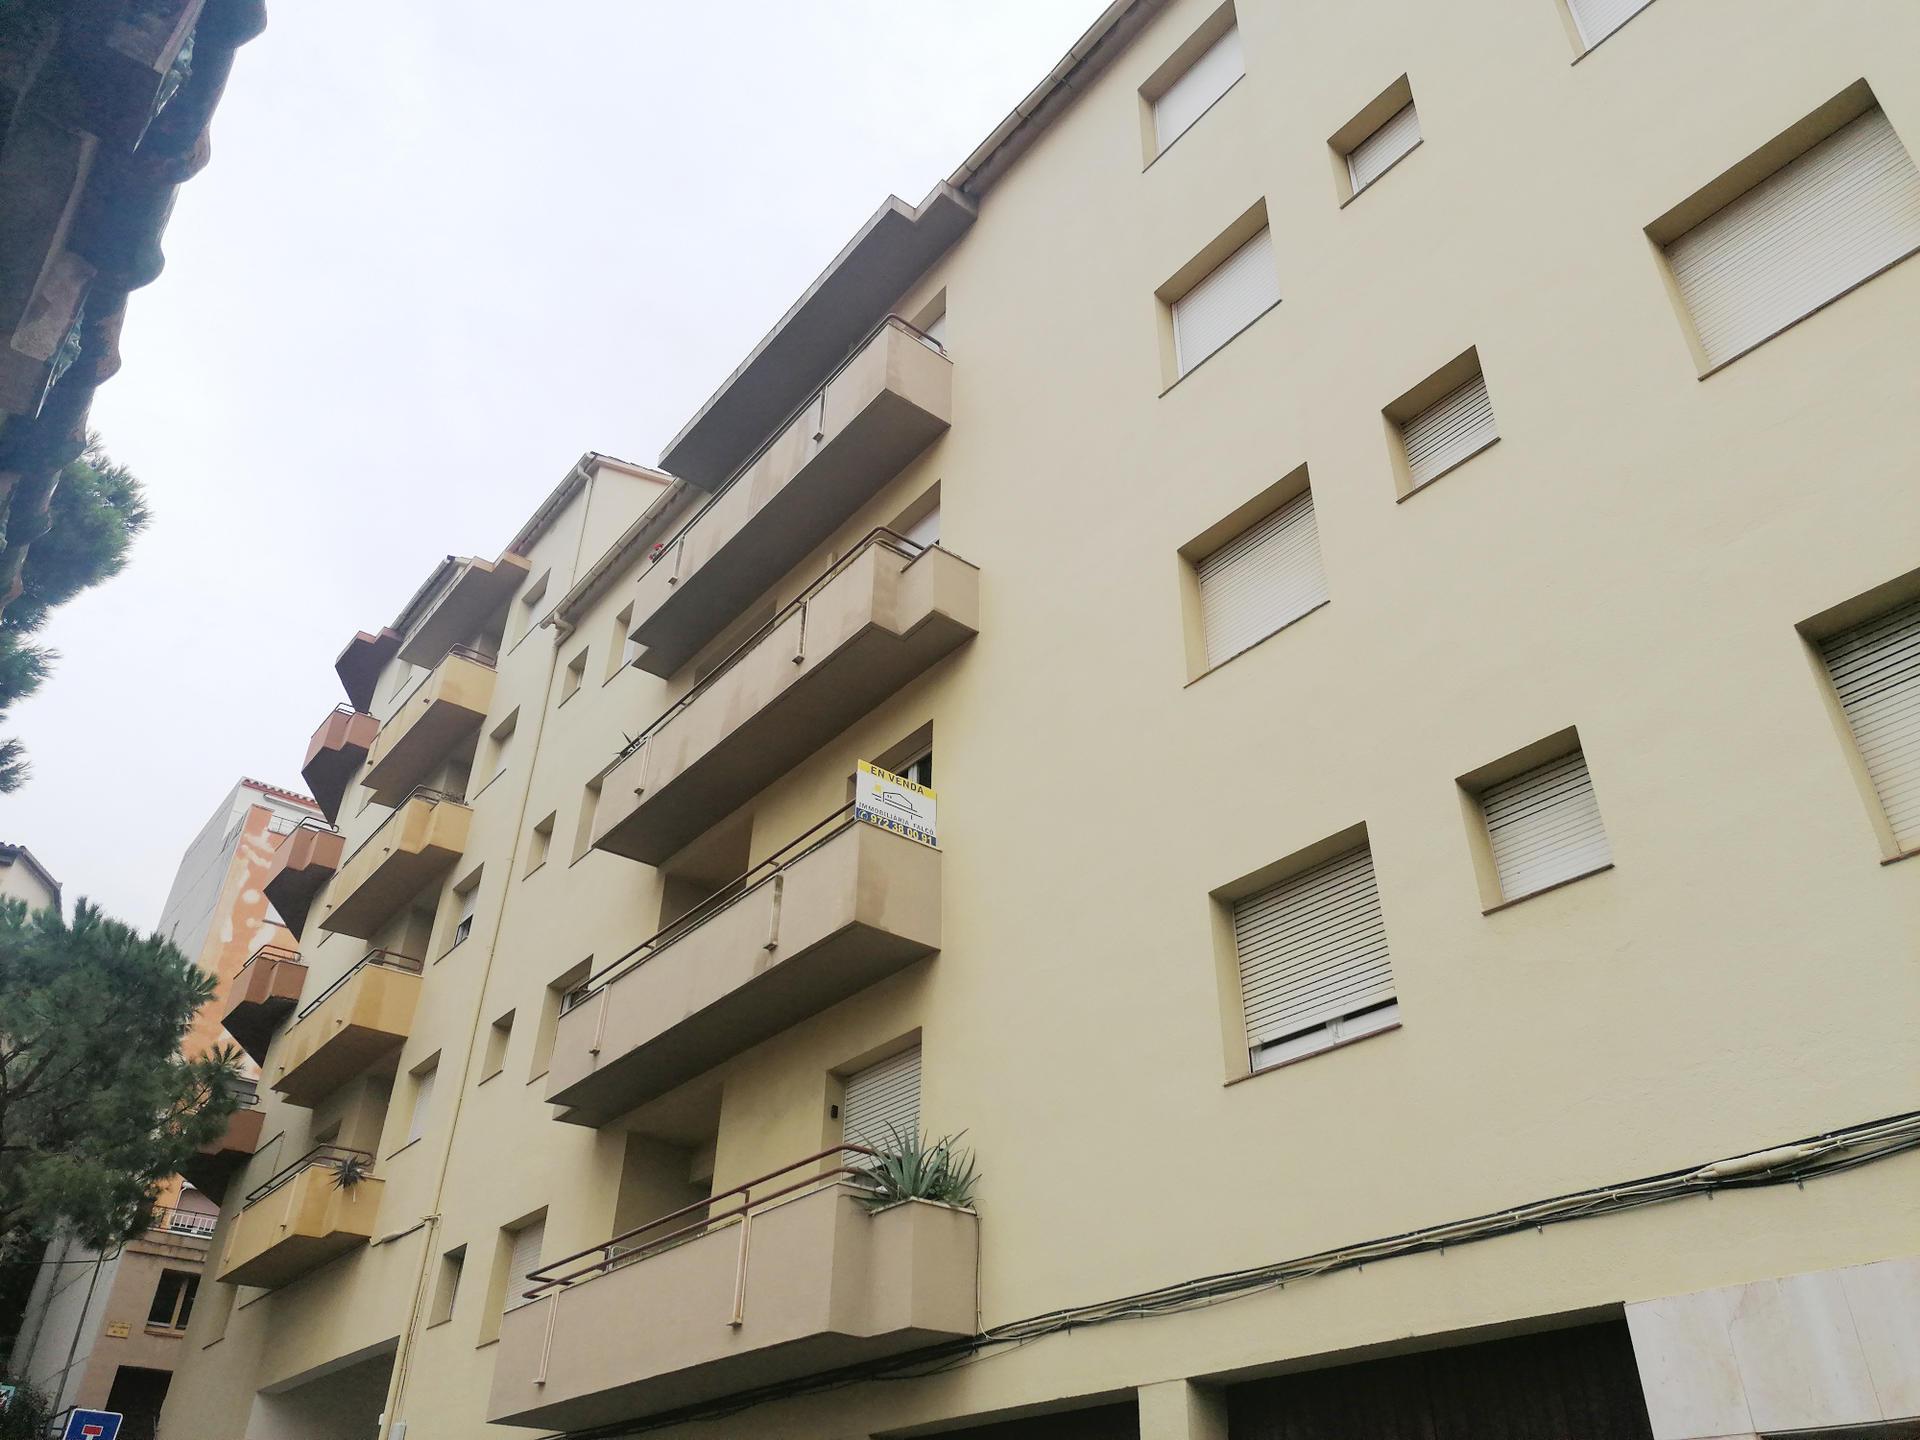 Apartament -                                       Portbou -                                       4 dormitoris -                                       7 ocupants